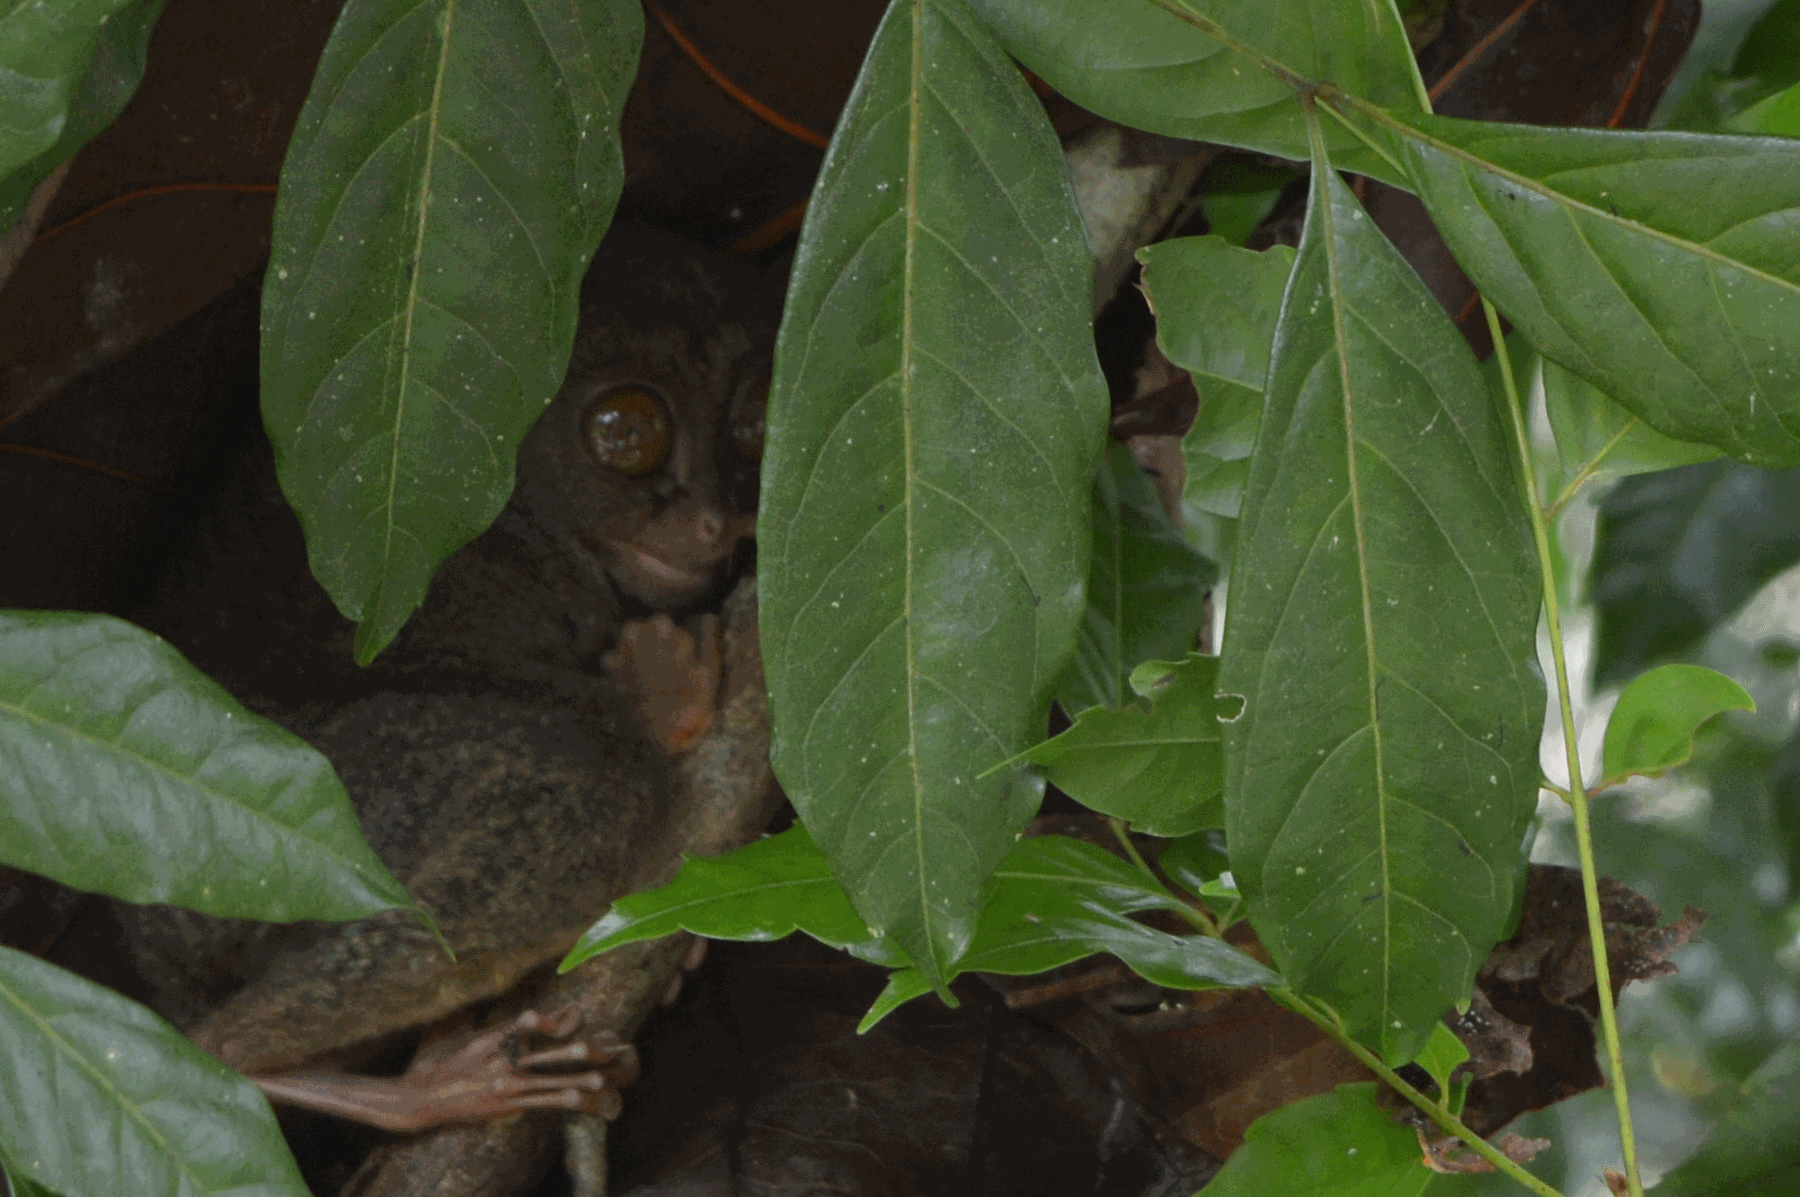 A wide-eyed tarsier